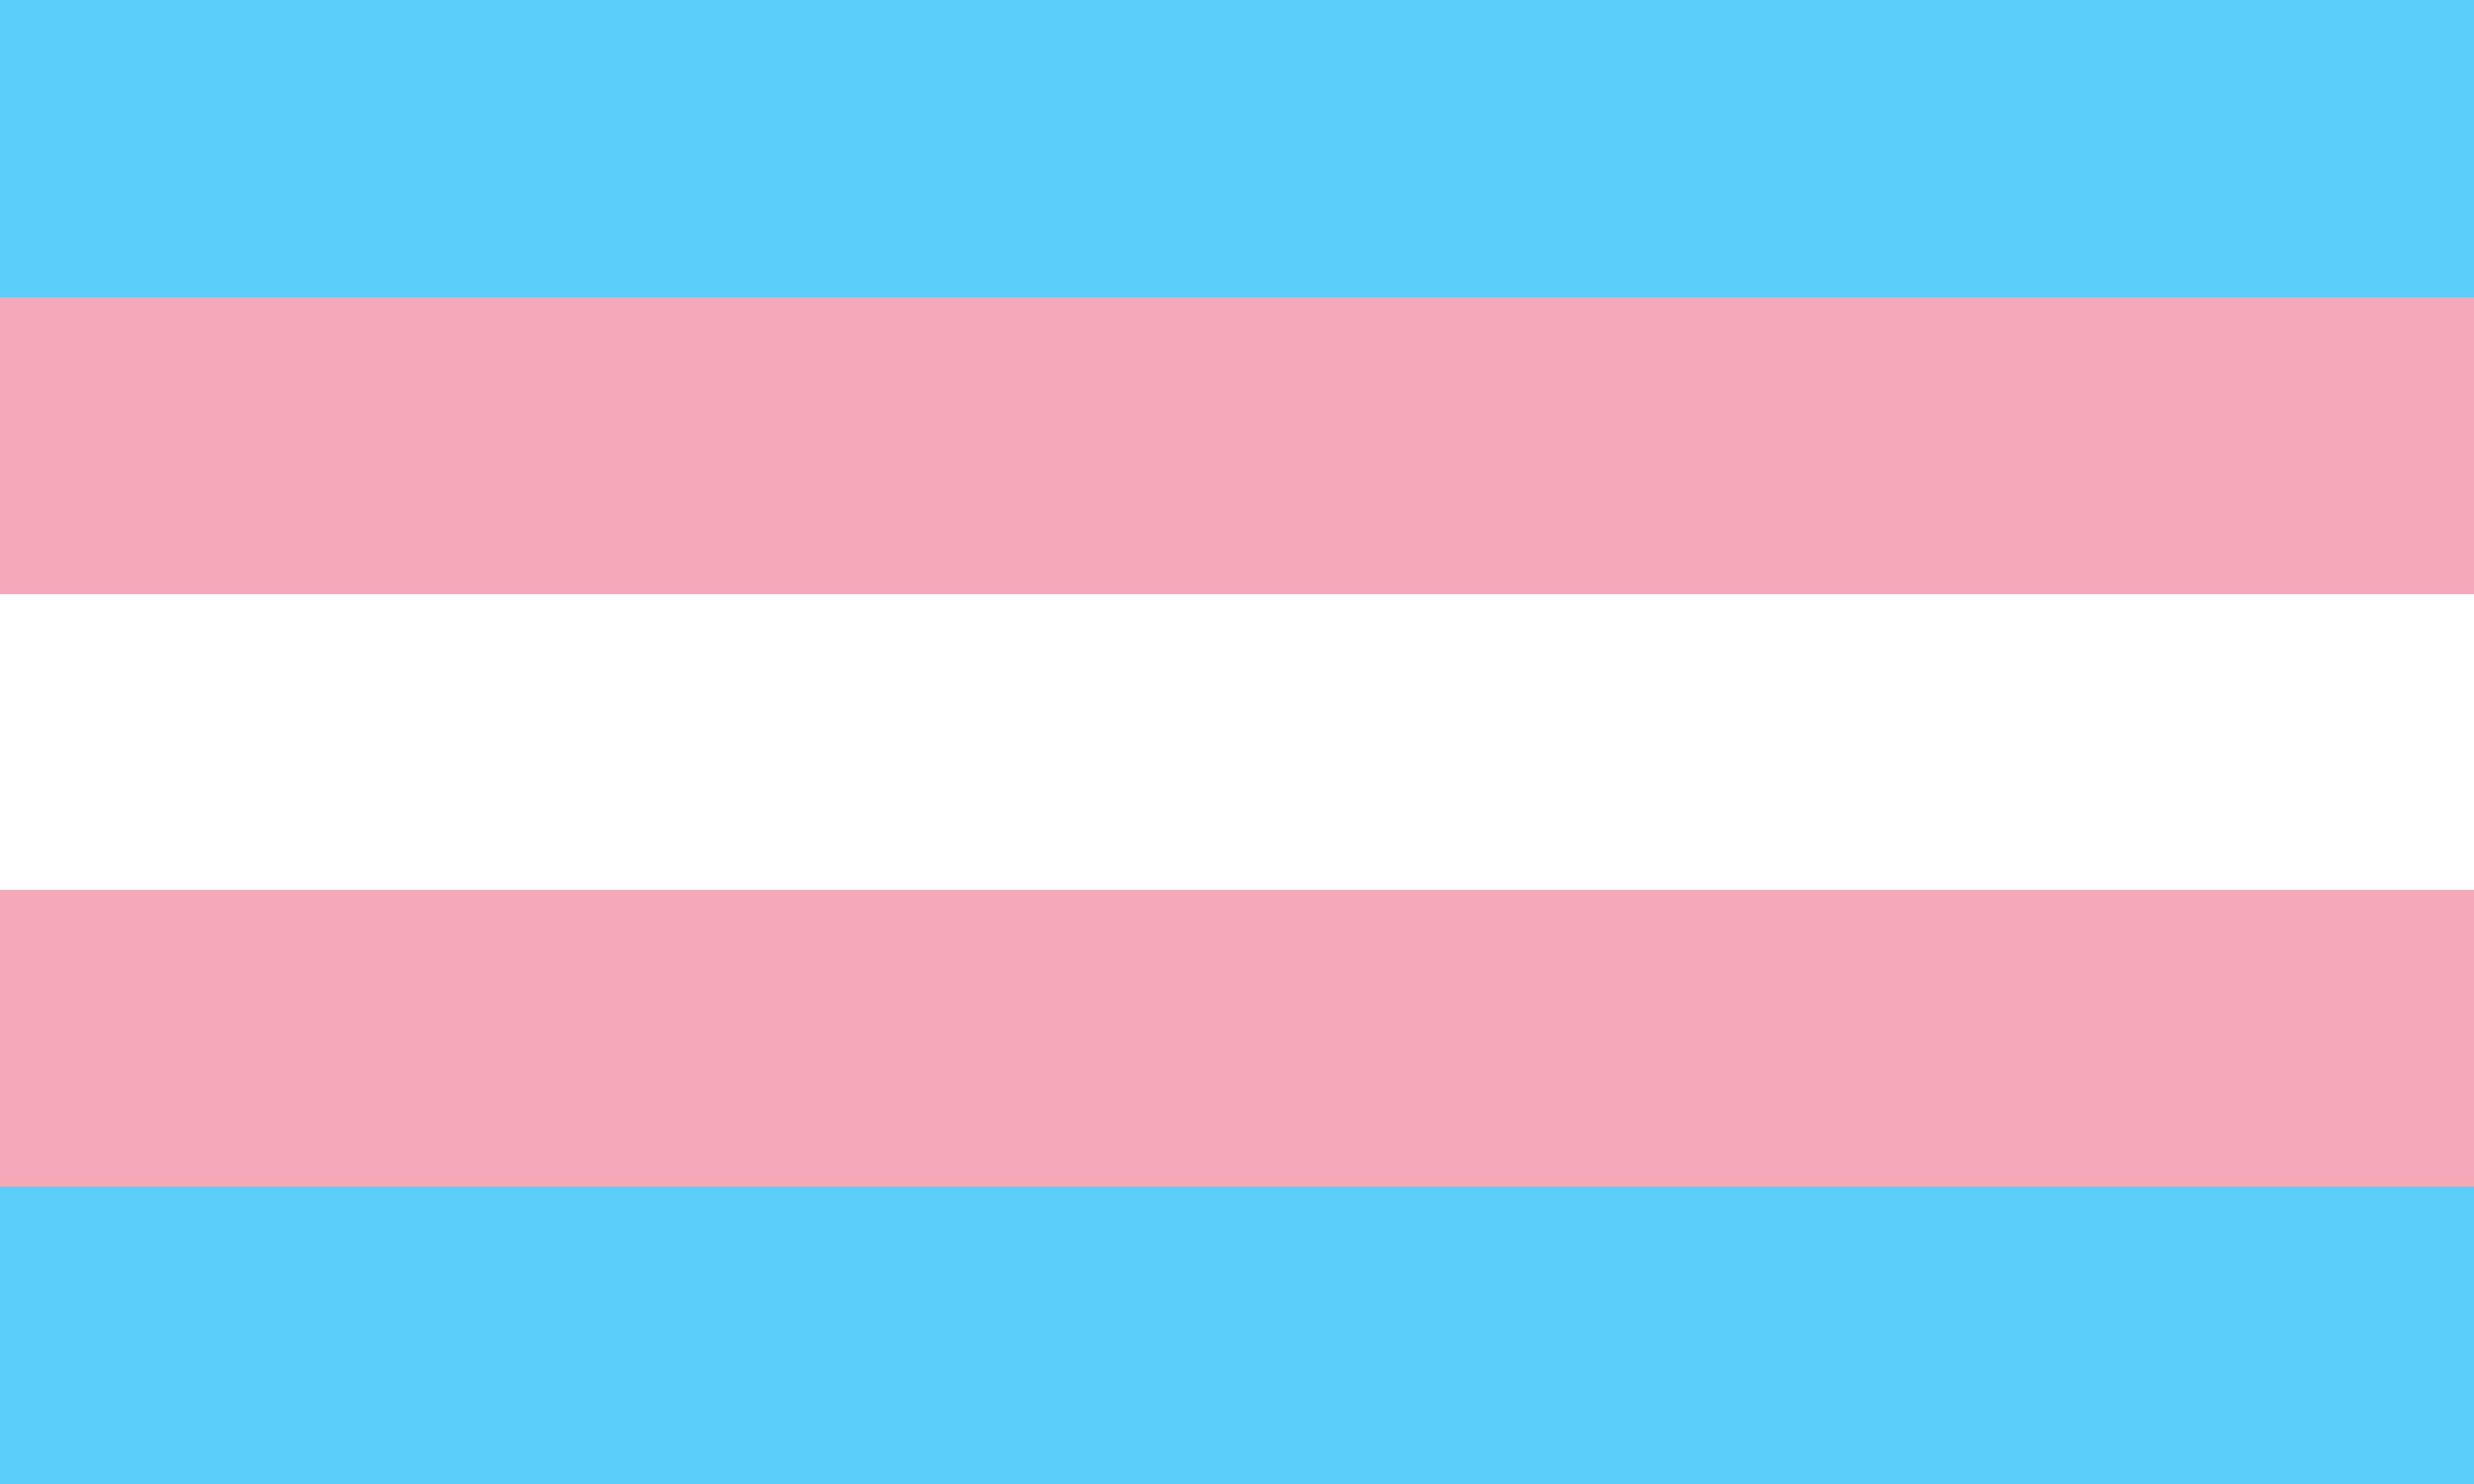 transgender pride flag by pride flags d8zu7zf